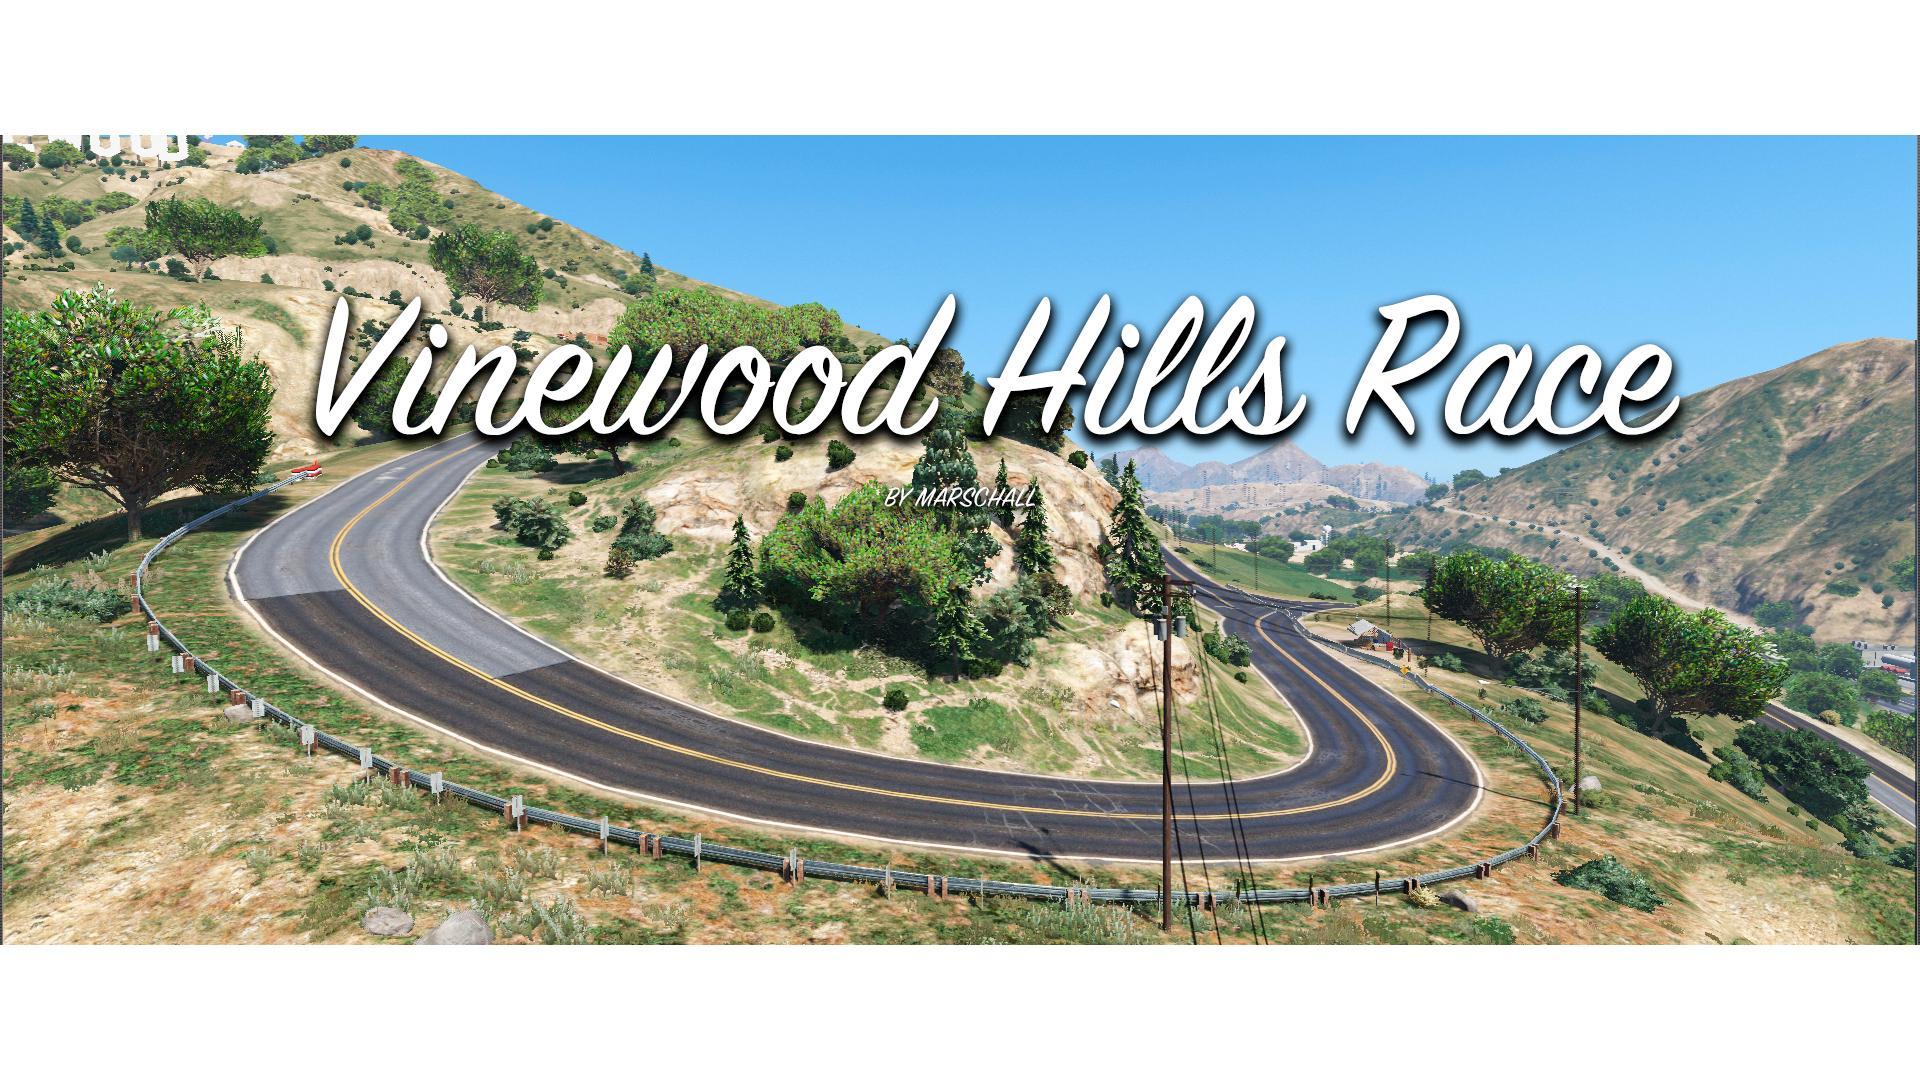 vinewood hills gta 5 - photo #9